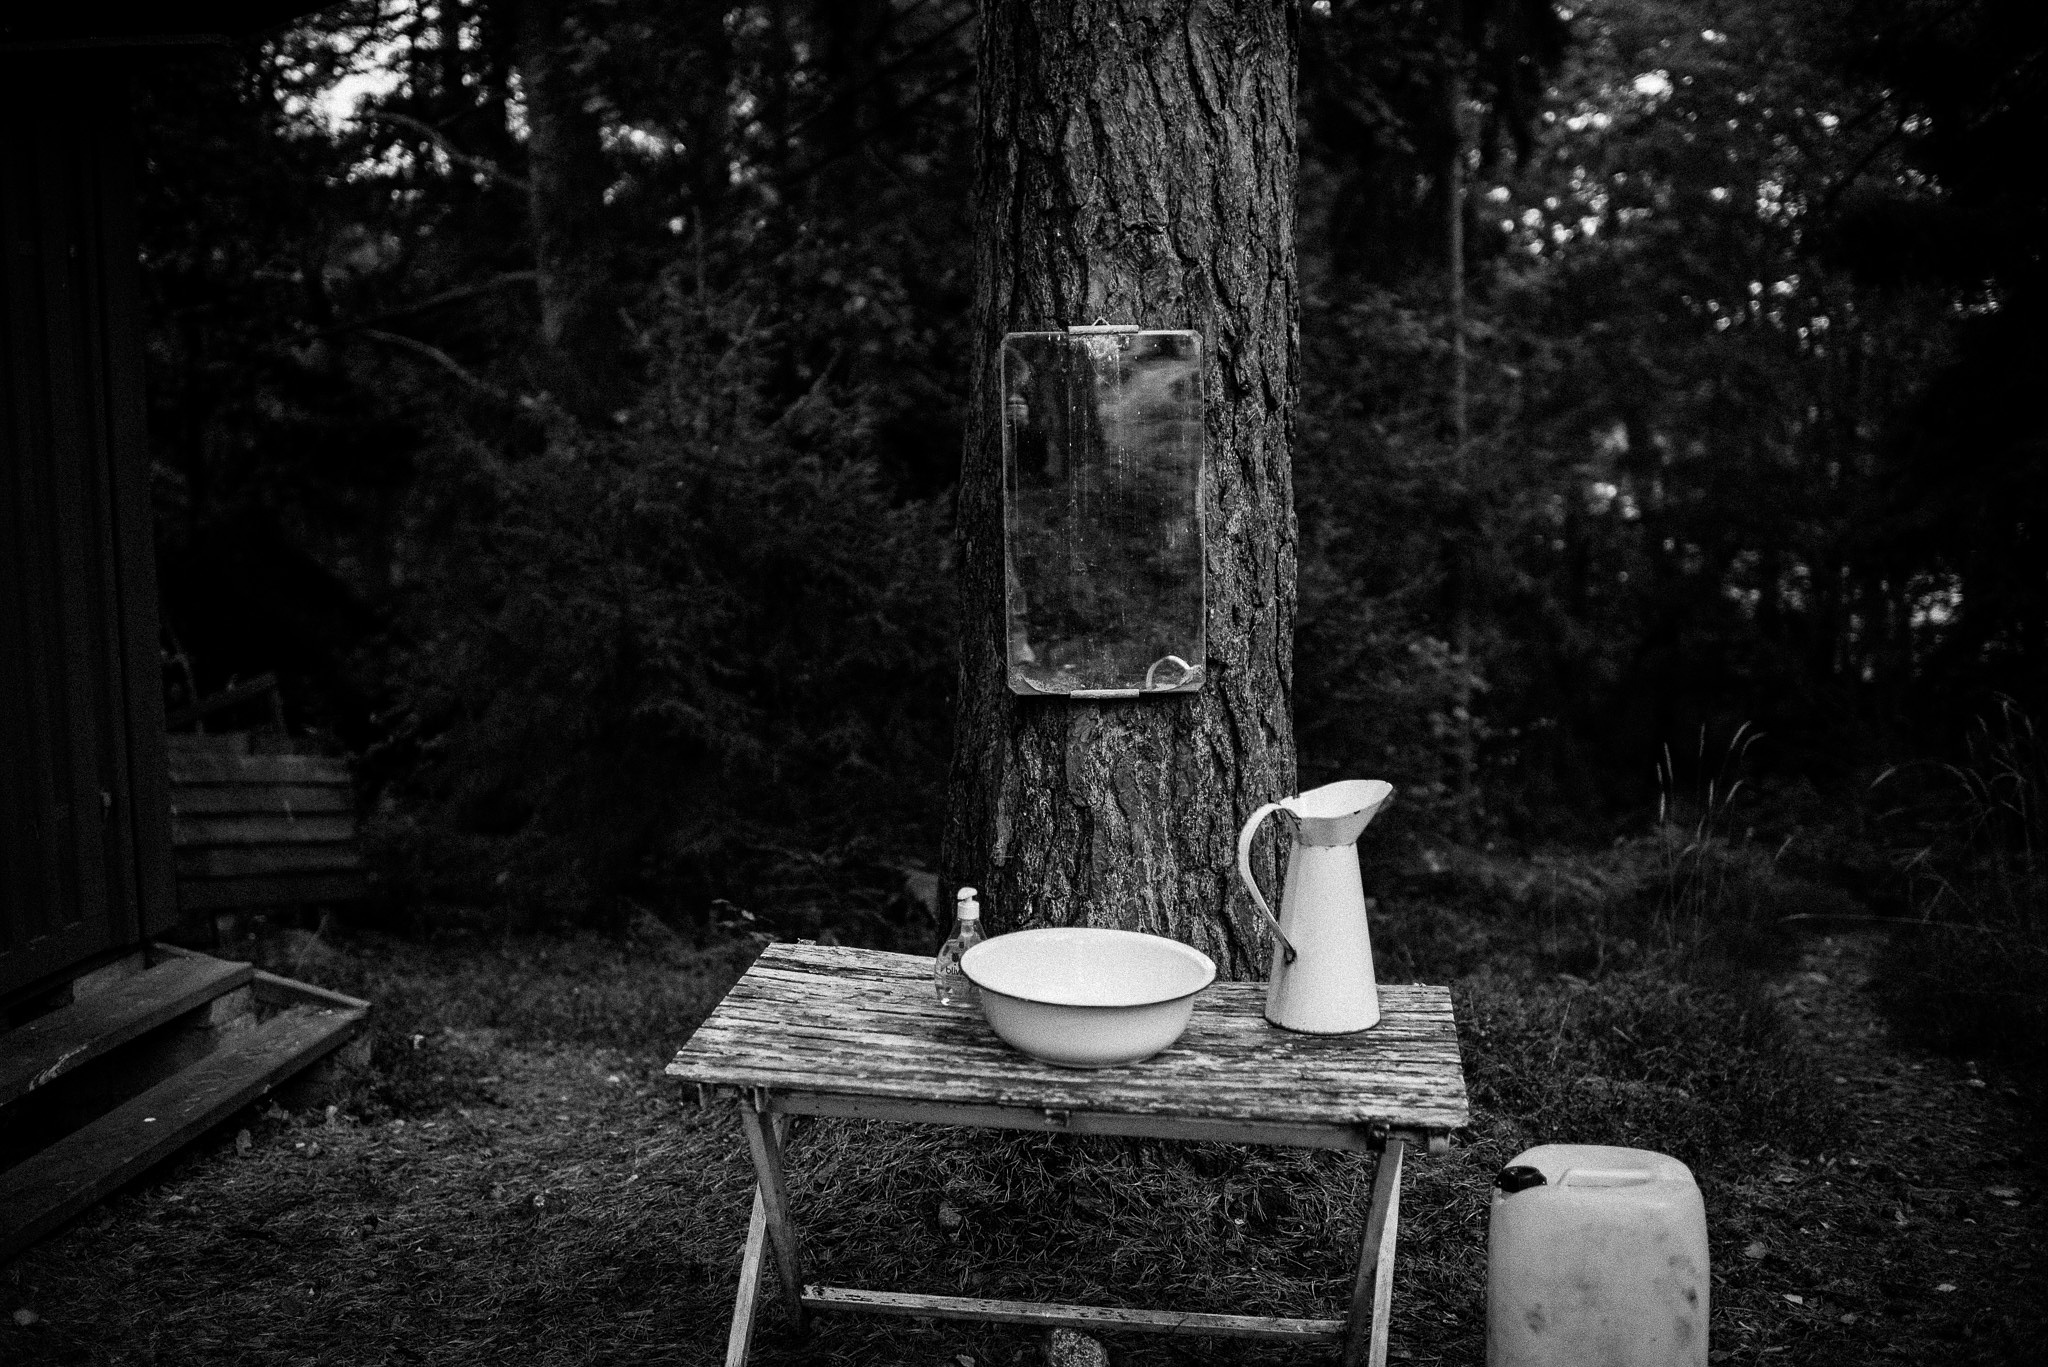 Old days by Fredrik Strandin